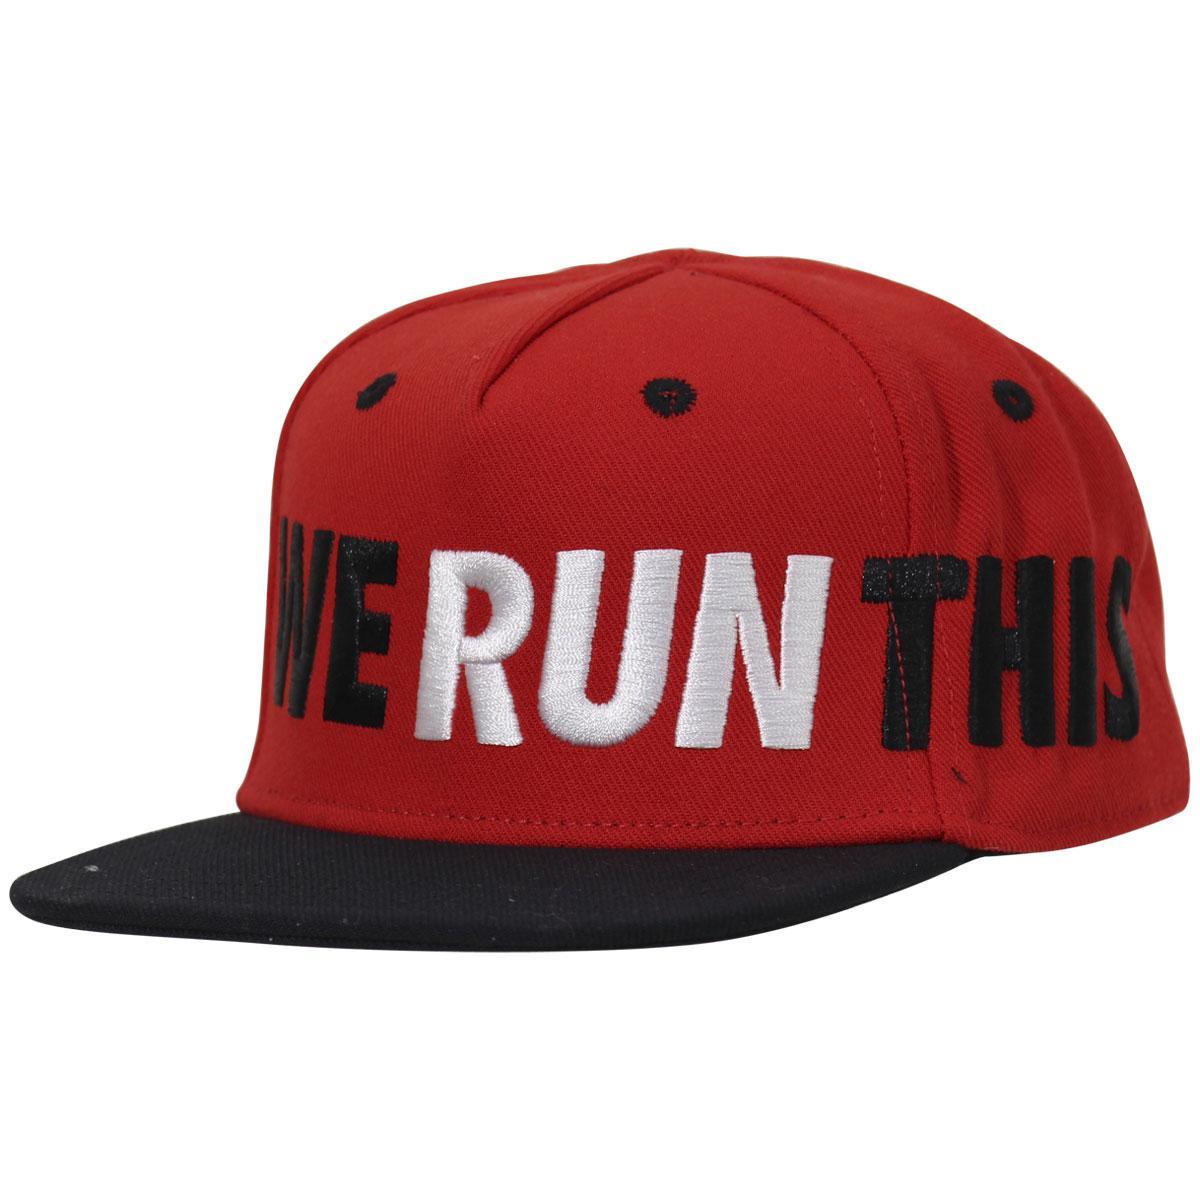 7564600df Nike Infant/Toddler Boy's Embroidered Snapback Baseball Cap Hat